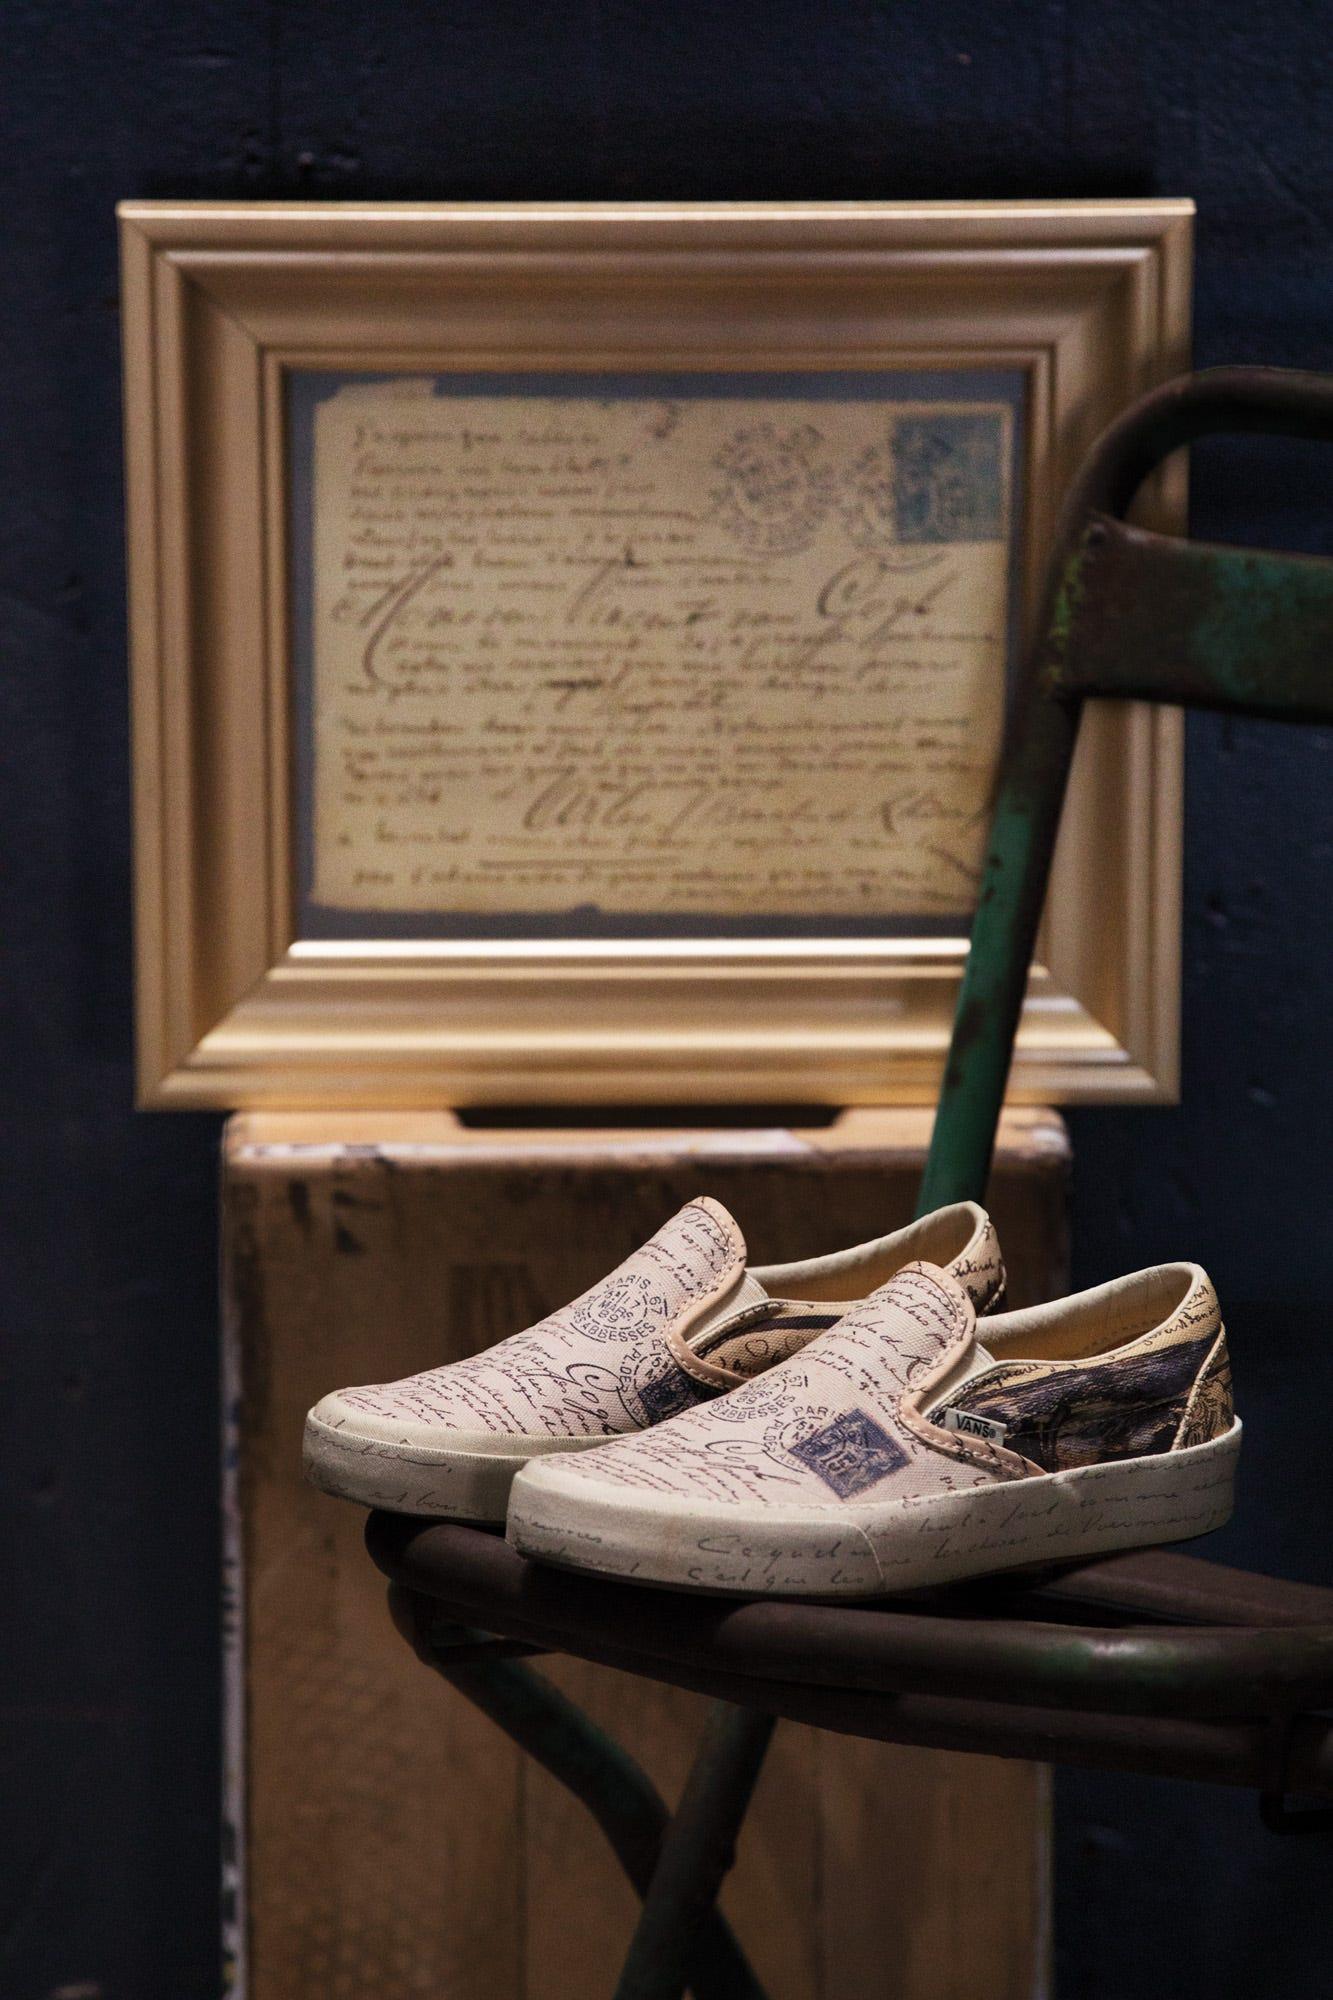 d681e4ce5649 Vans x Van Gogh Sneaker   Clothing Collab Is Pure Art